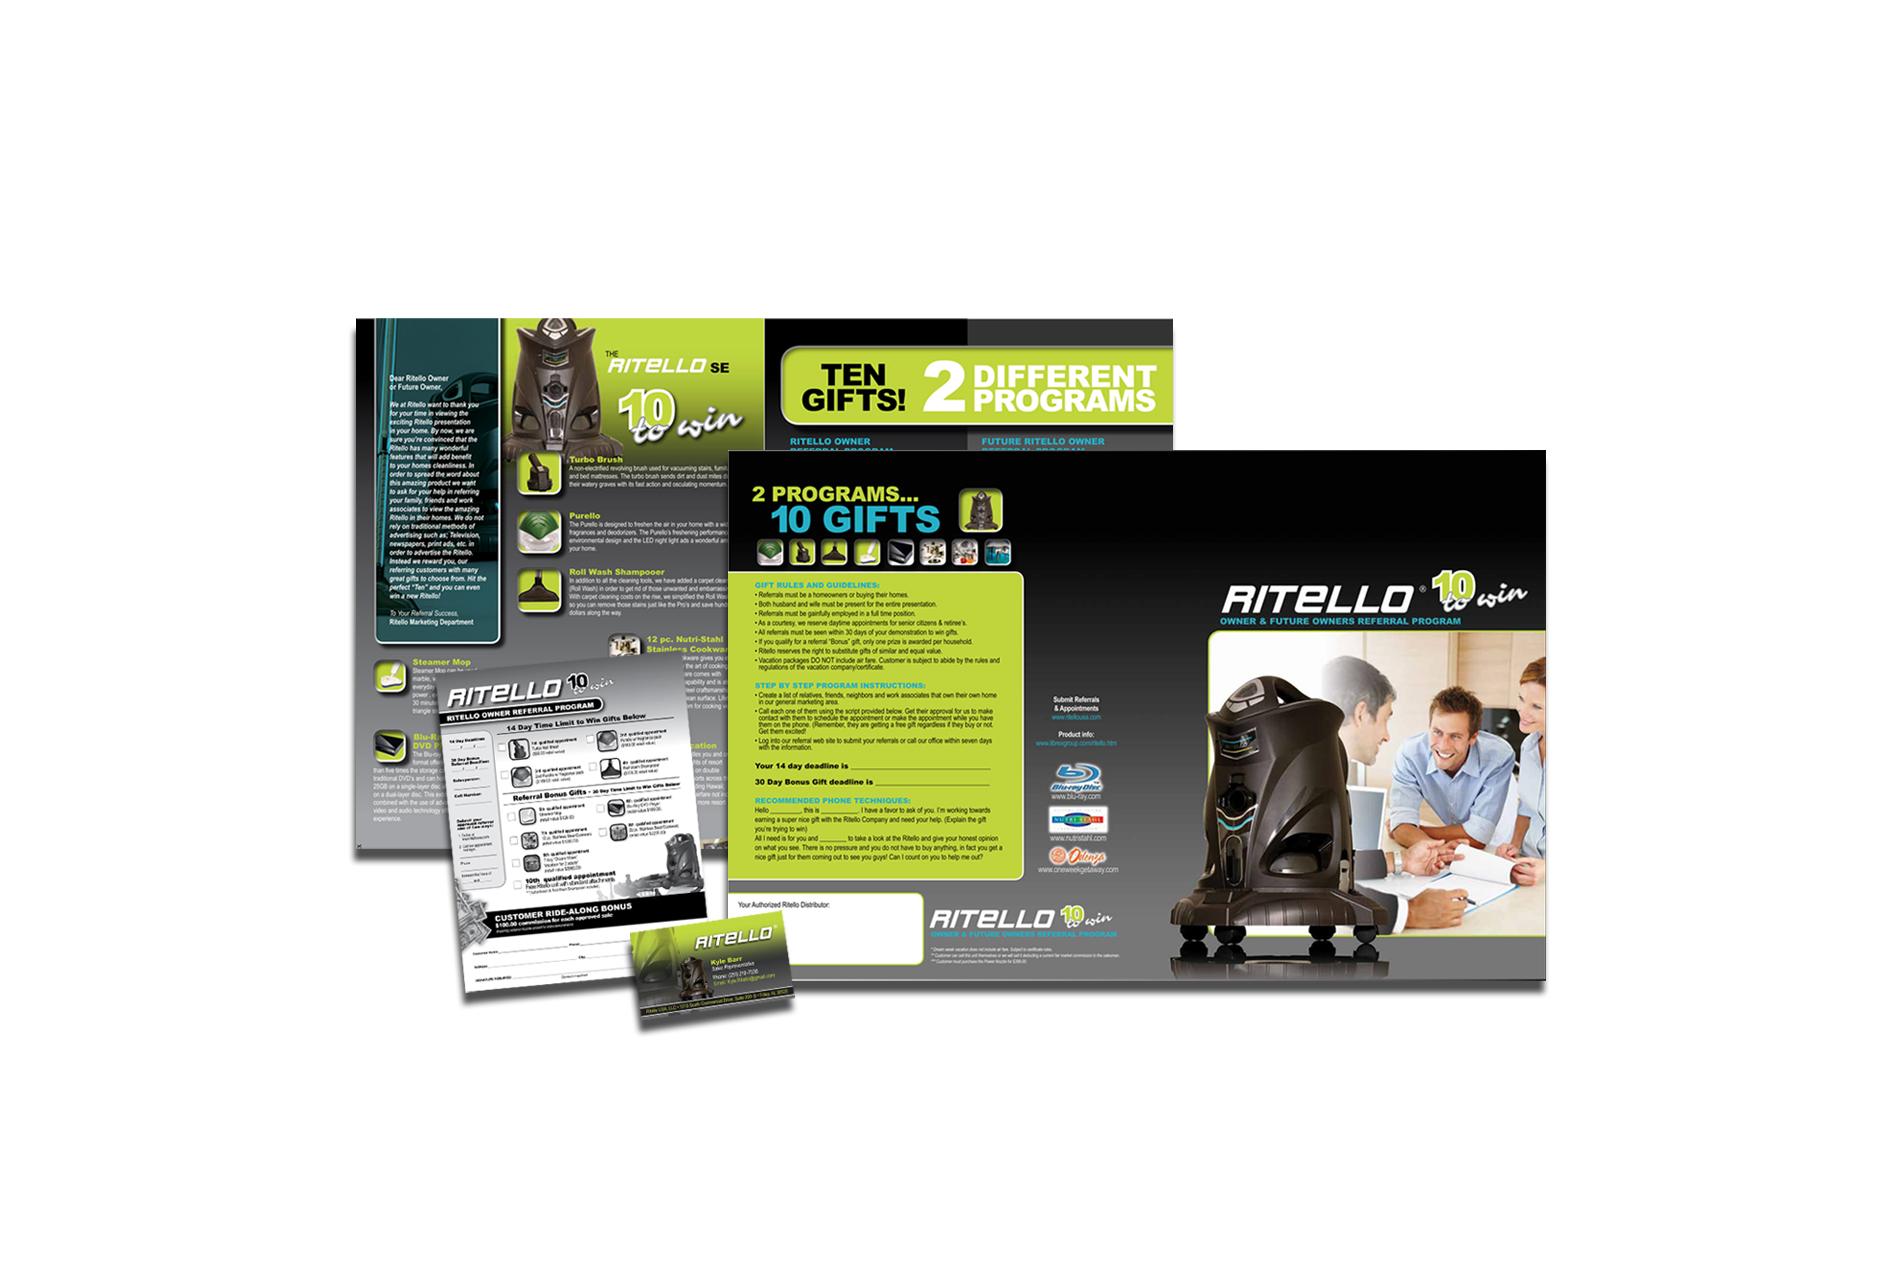 Ritello Marketing Brochures